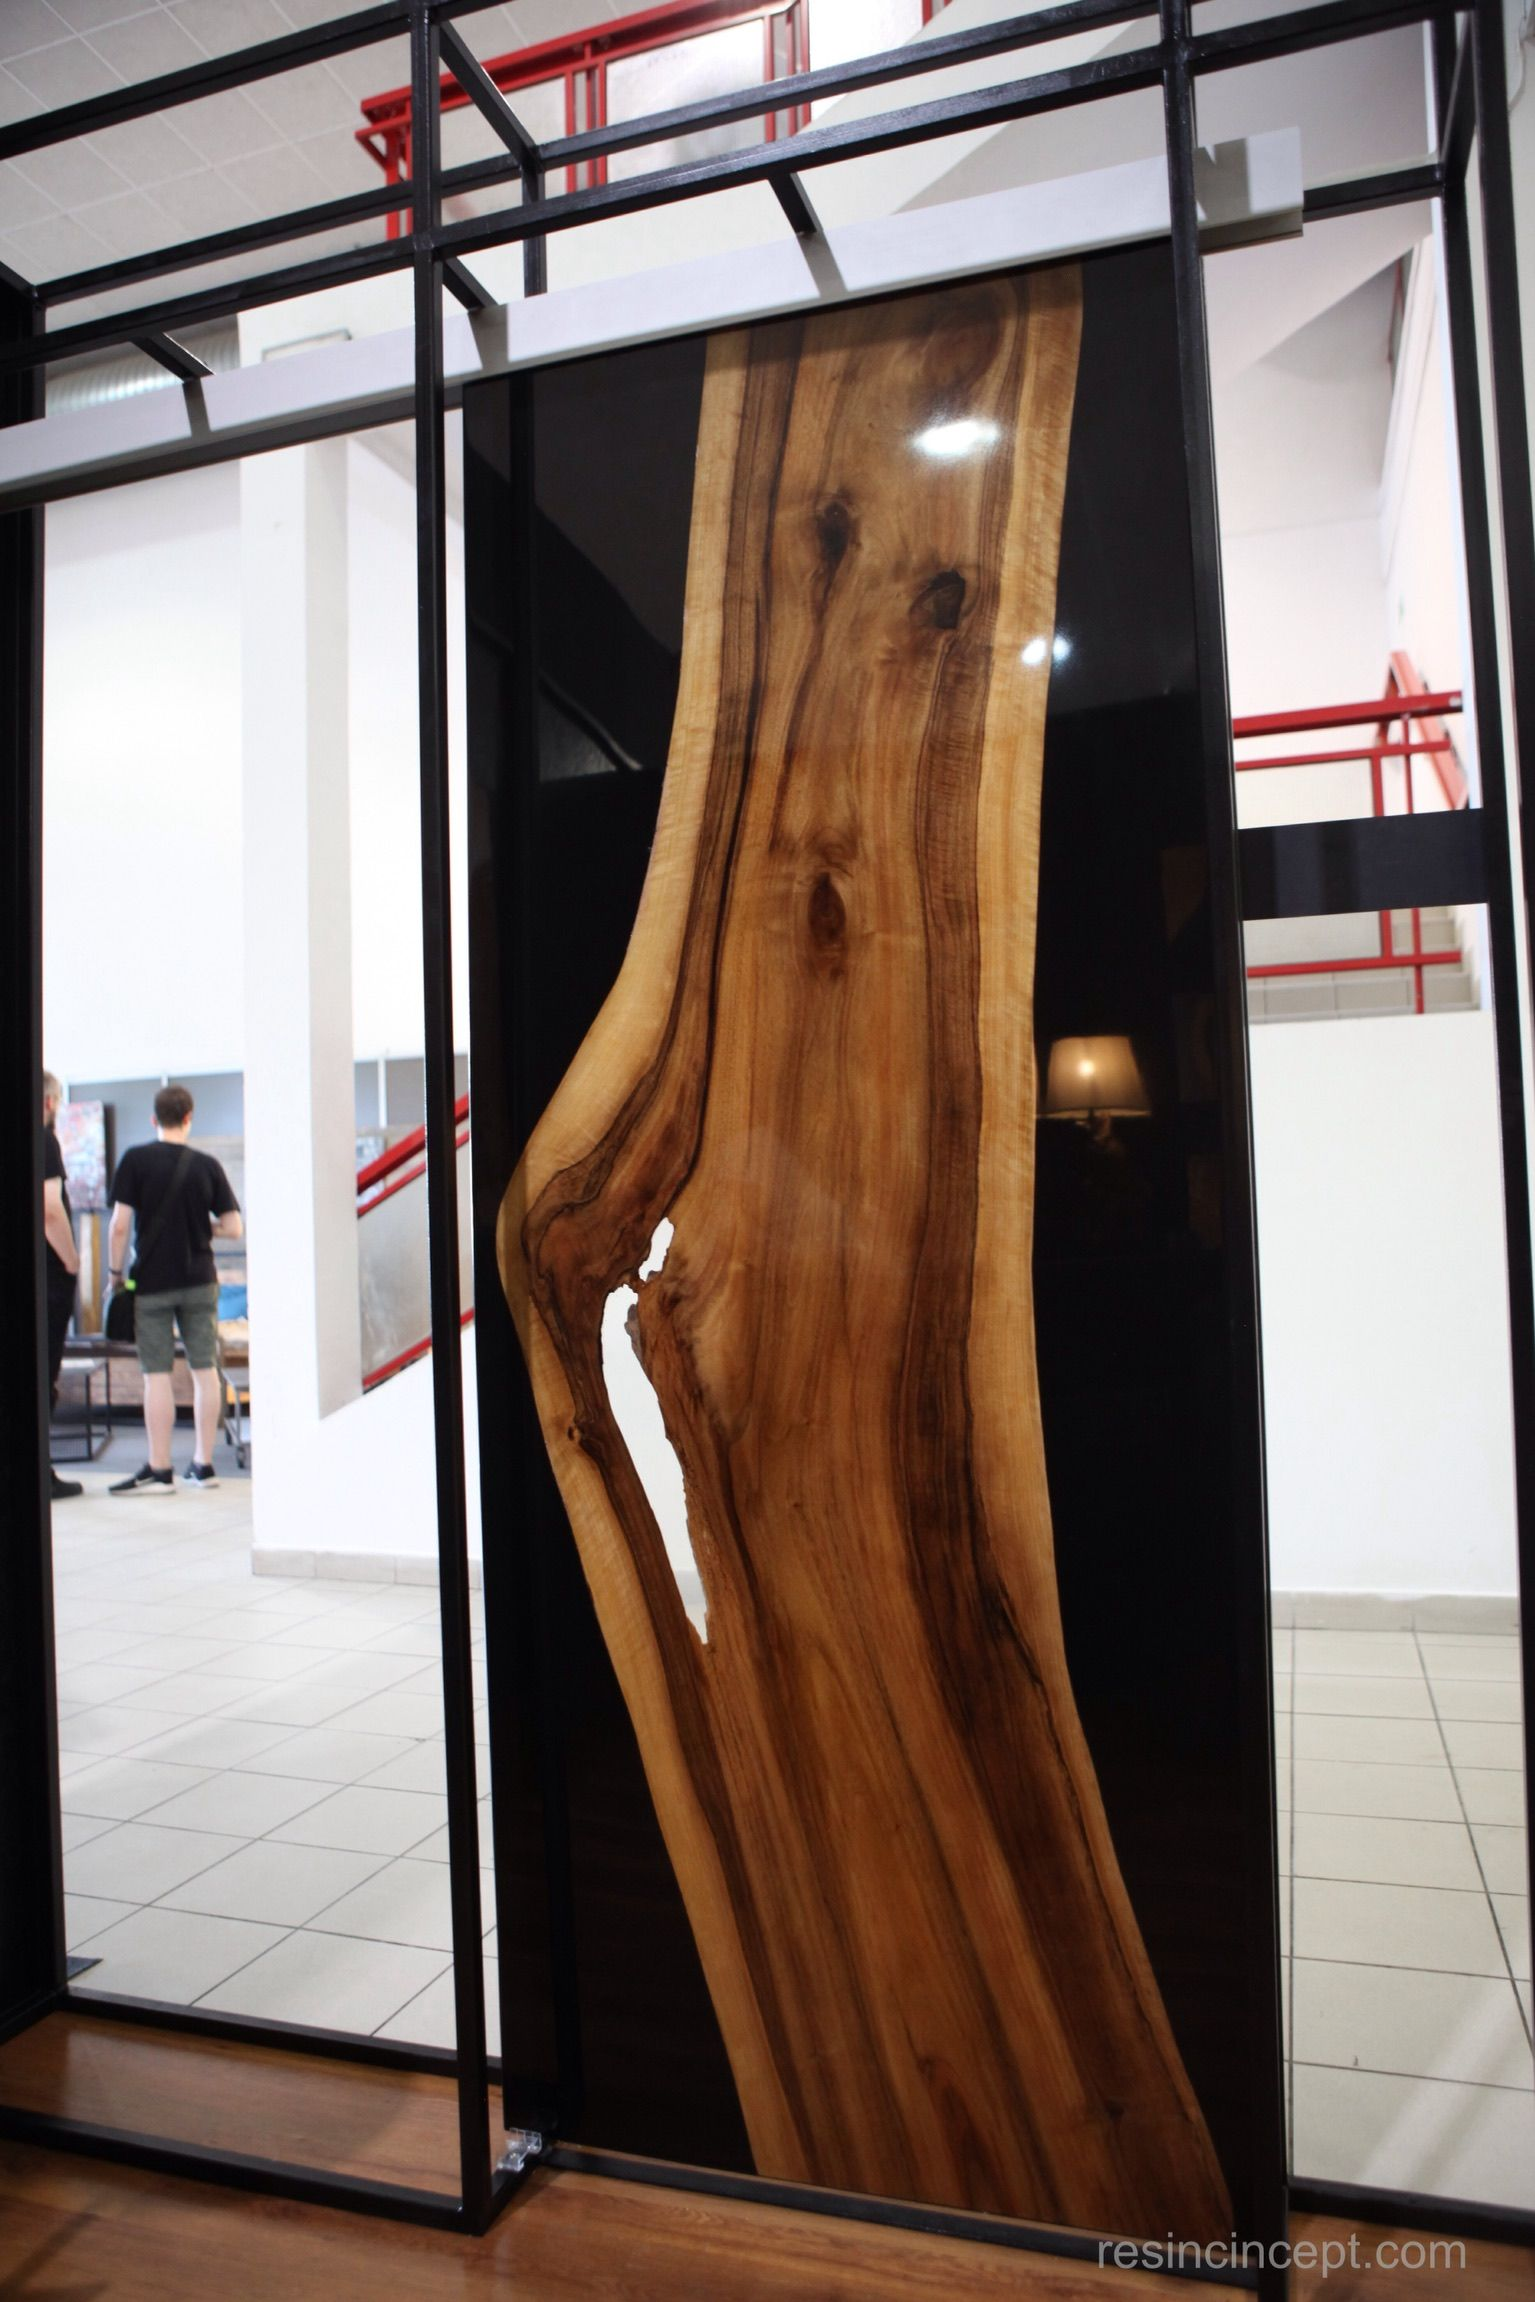 Epoxy Resin Walnut Sliding Doors Resin Concept Resin Furniture Wood Resin Table Epoxy Resin Flooring